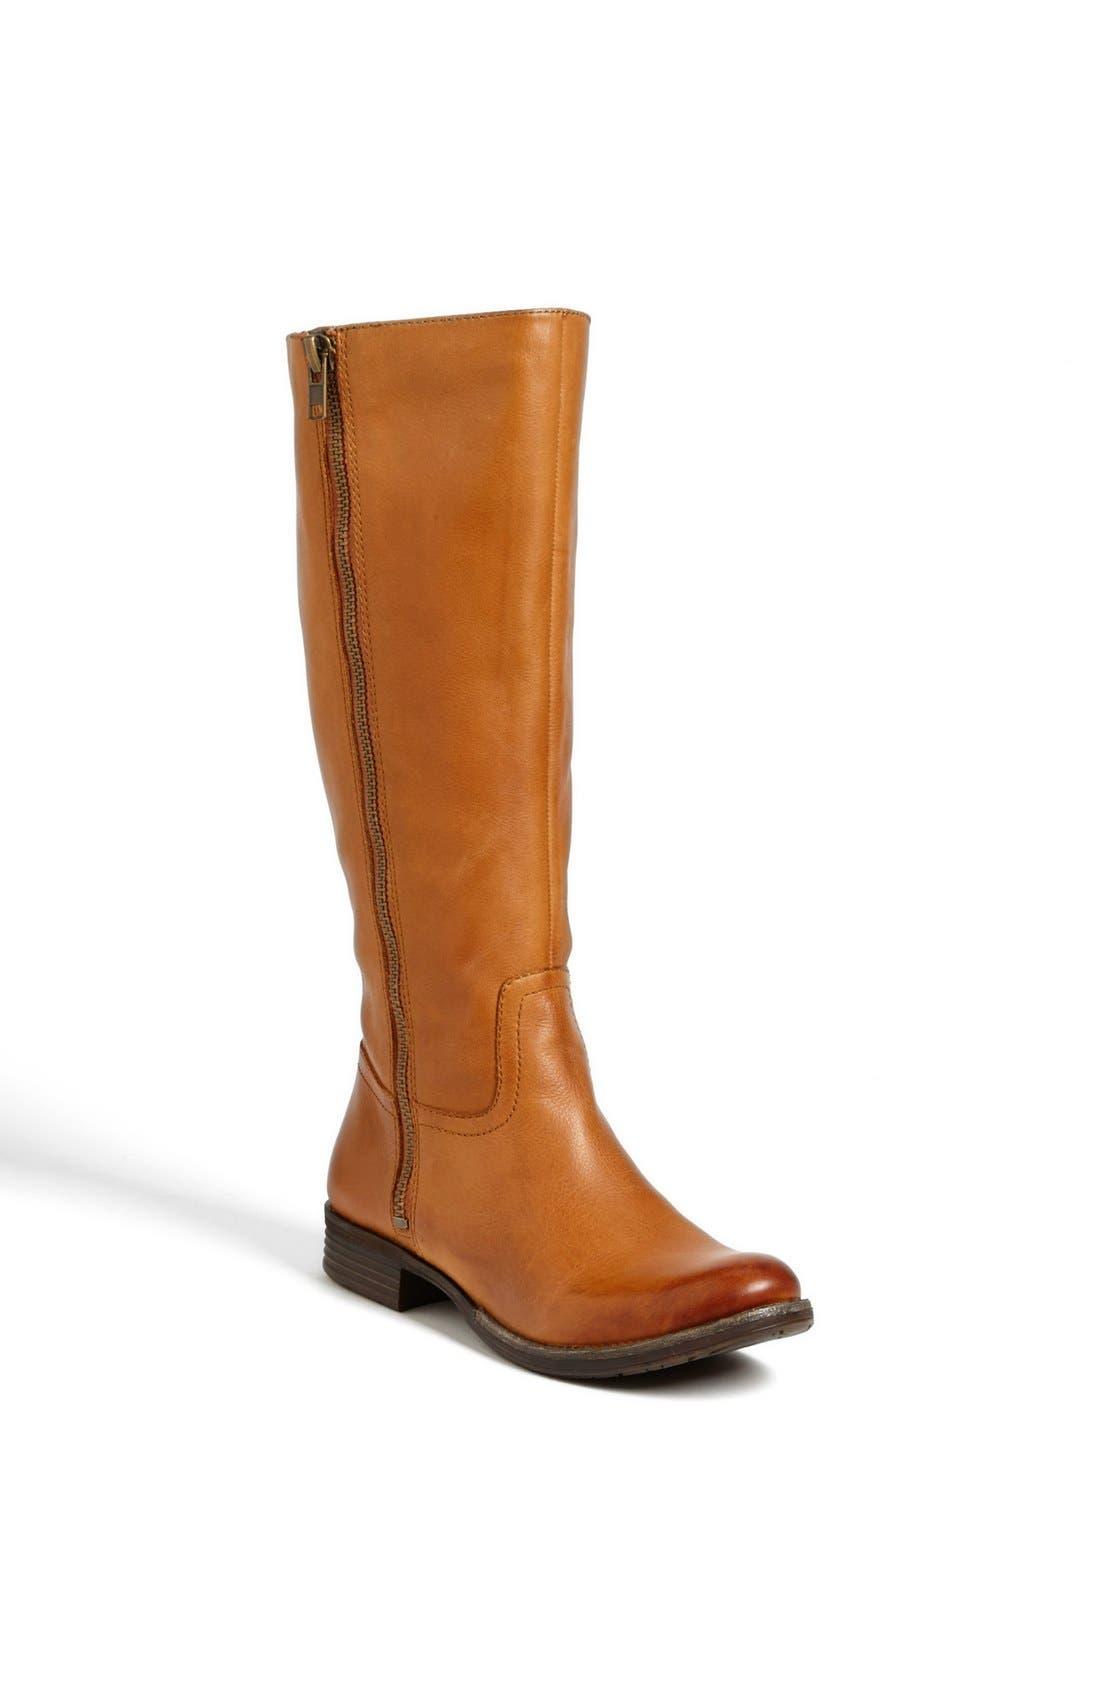 Alternate Image 1 Selected - Naya 'Abira' Boot